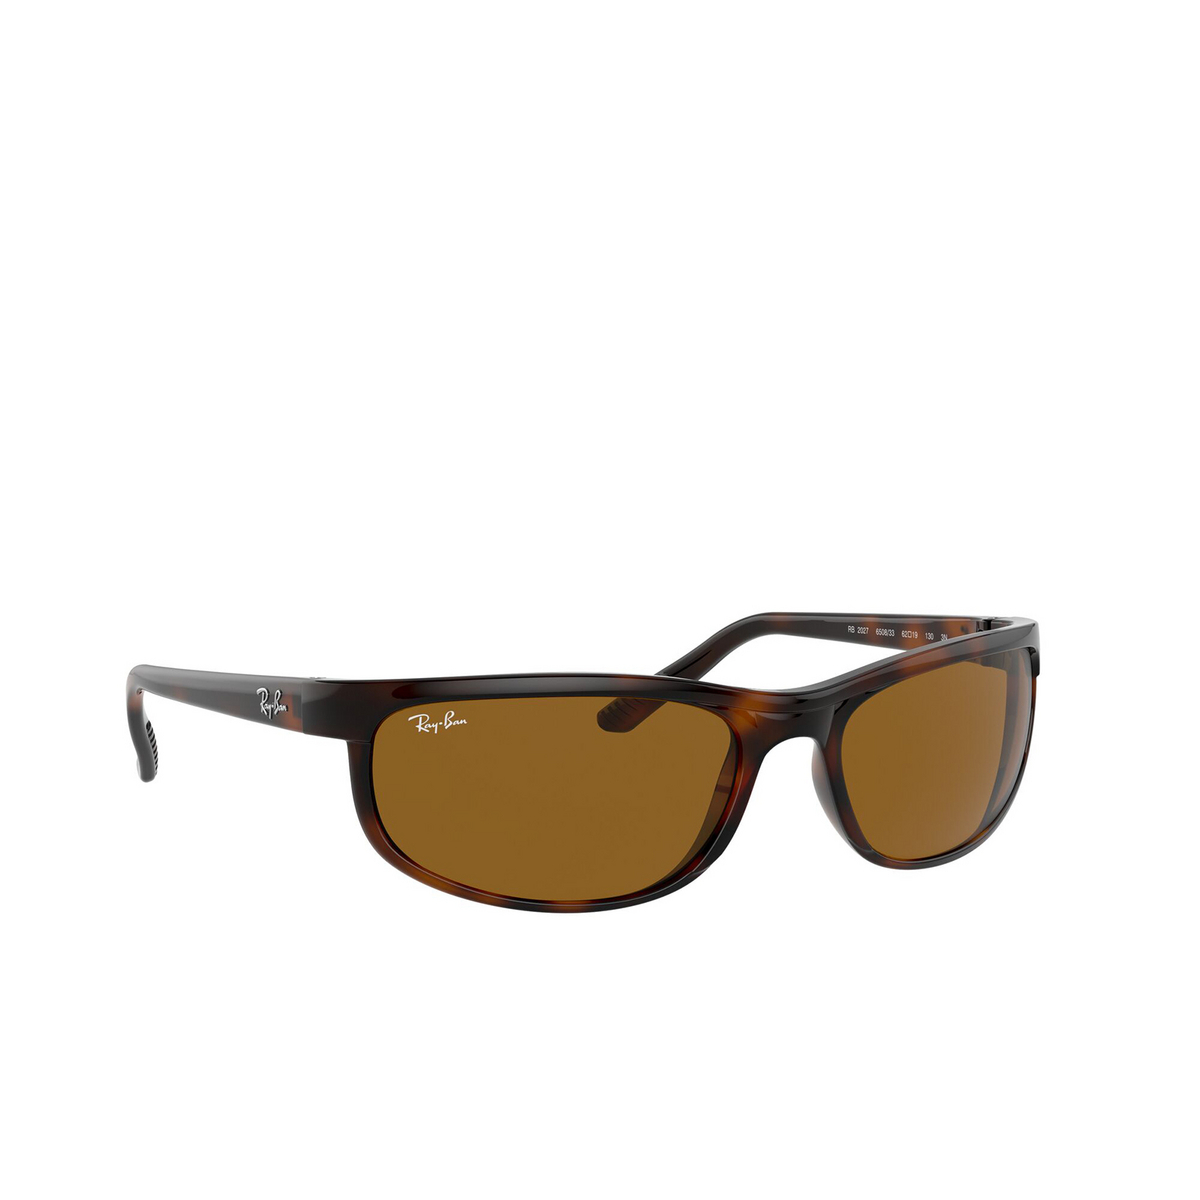 Ray-Ban® Rectangle Sunglasses: Predator 2 RB2027 color Dark Havana 650833 - three-quarters view.